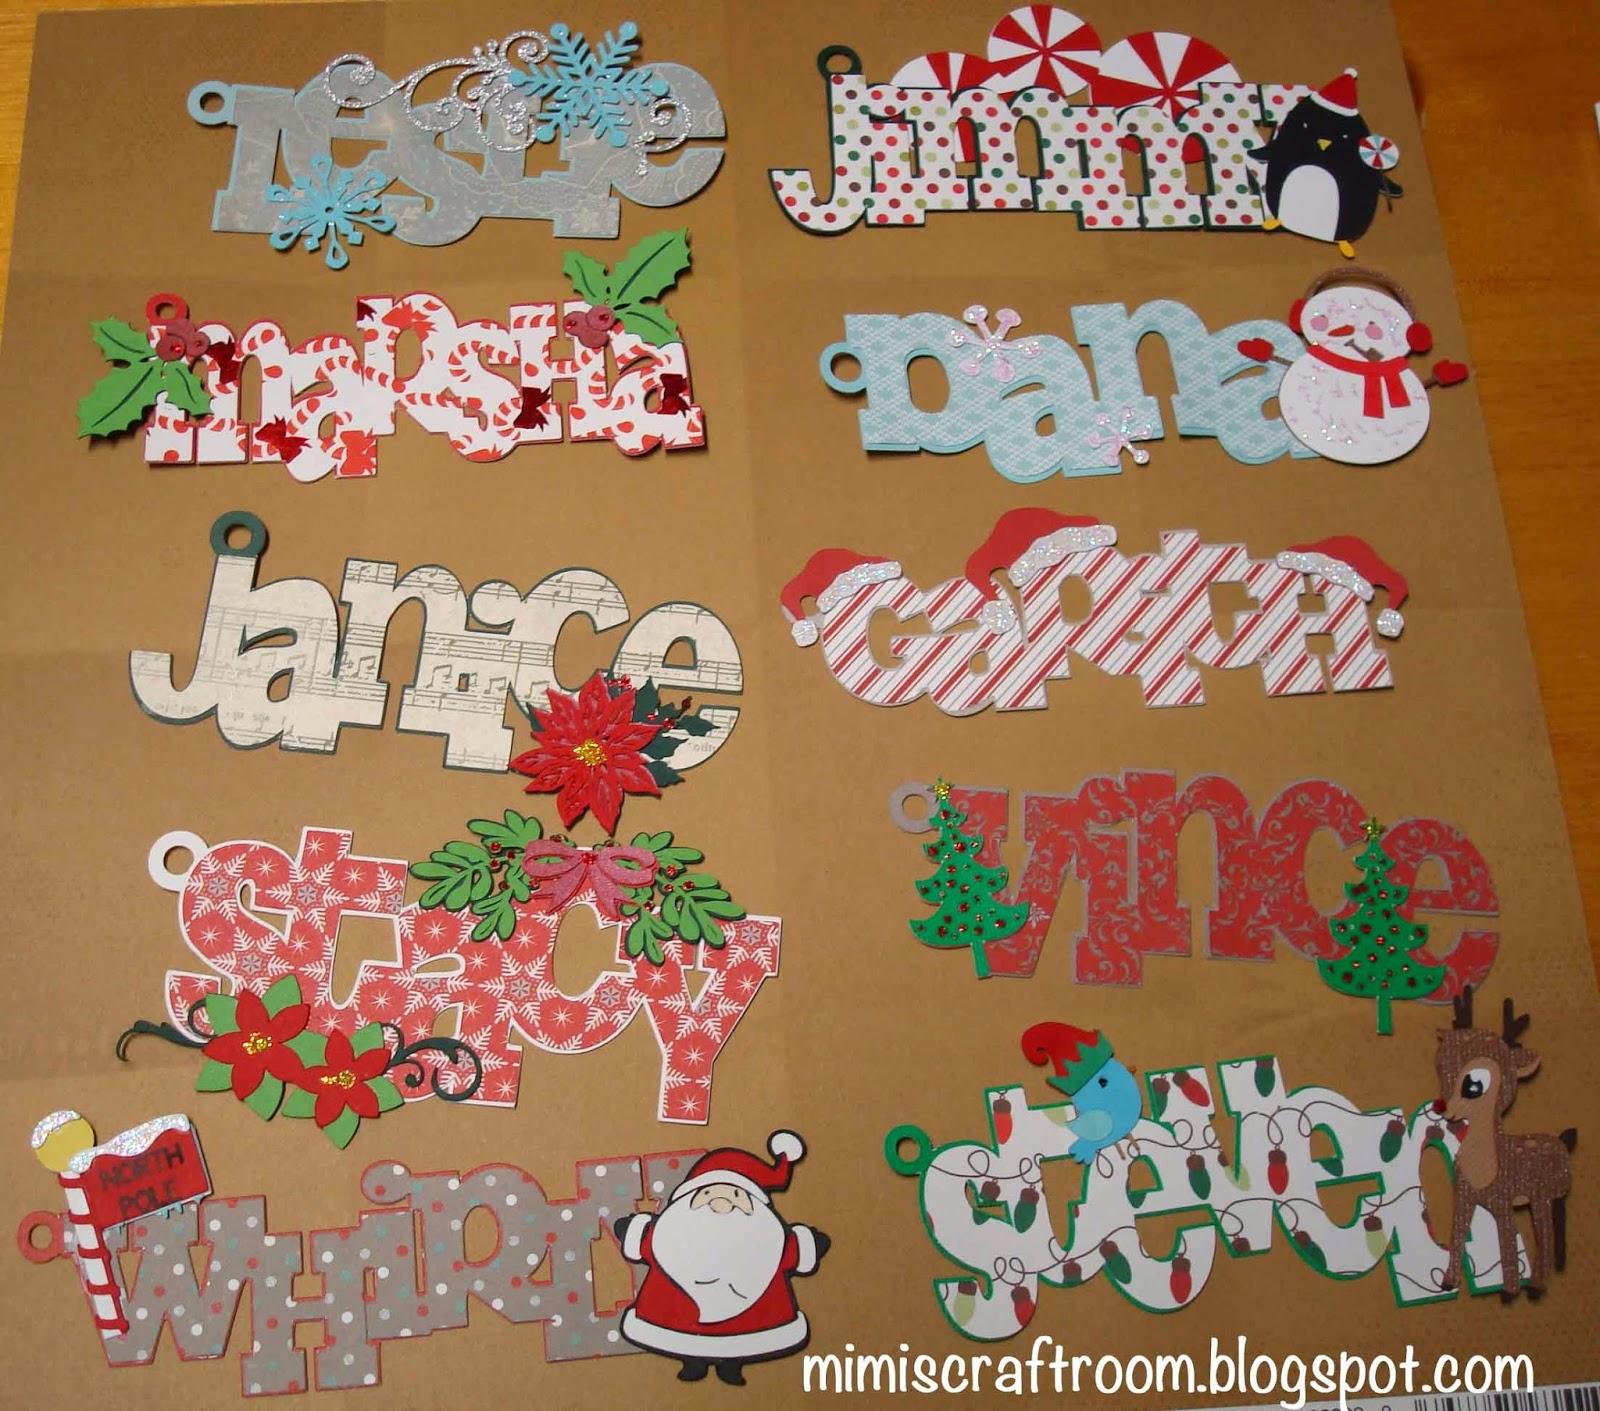 Mimis Craft Room Christmas Name Tags with Cricut Explore